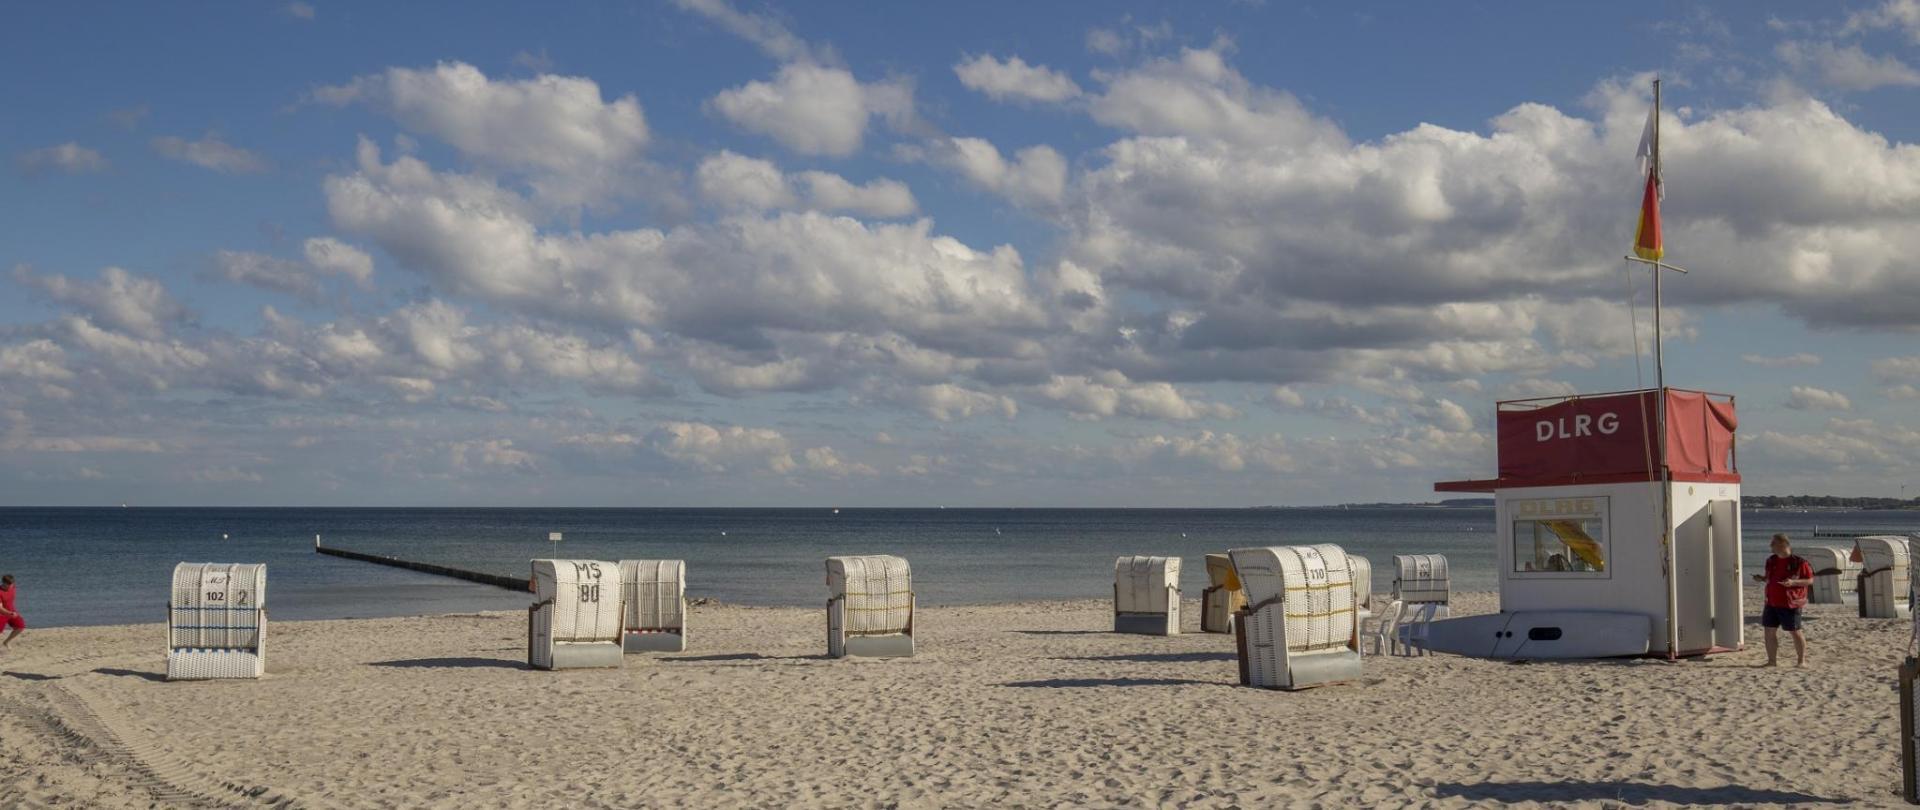 GroBro Strand1.jpg